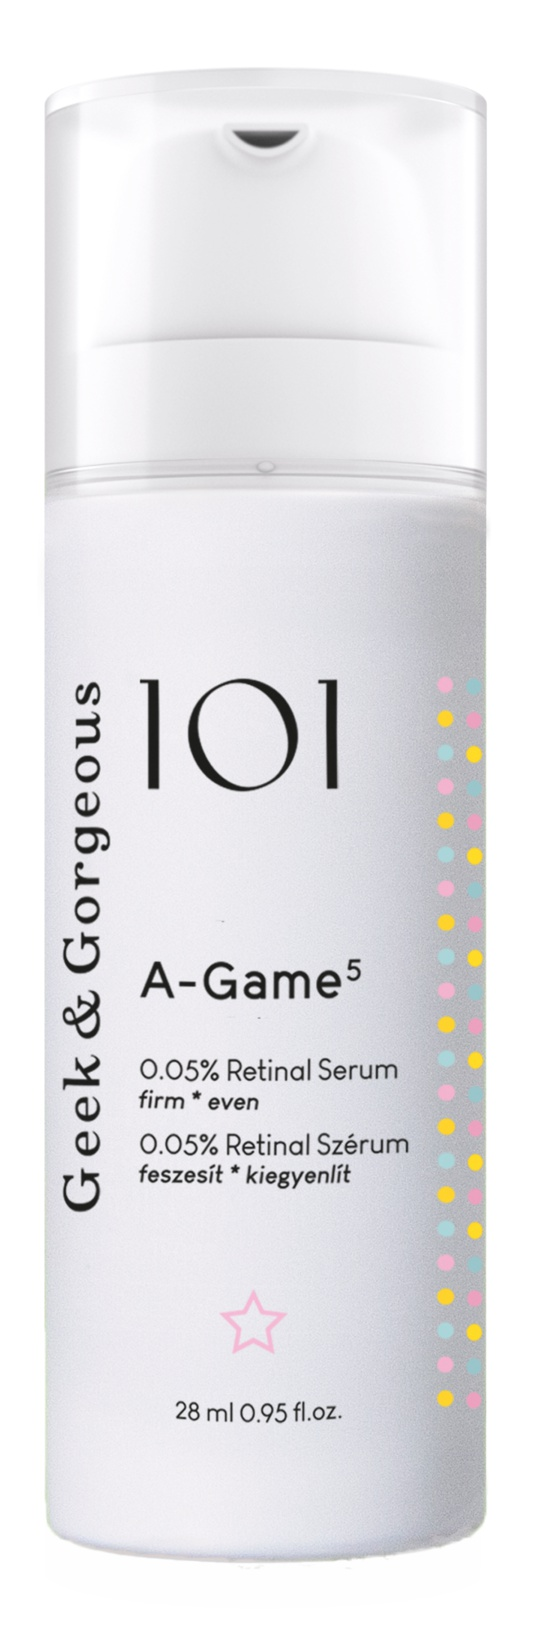 0.05% | A-Game 5 0.05% Retinal Serum